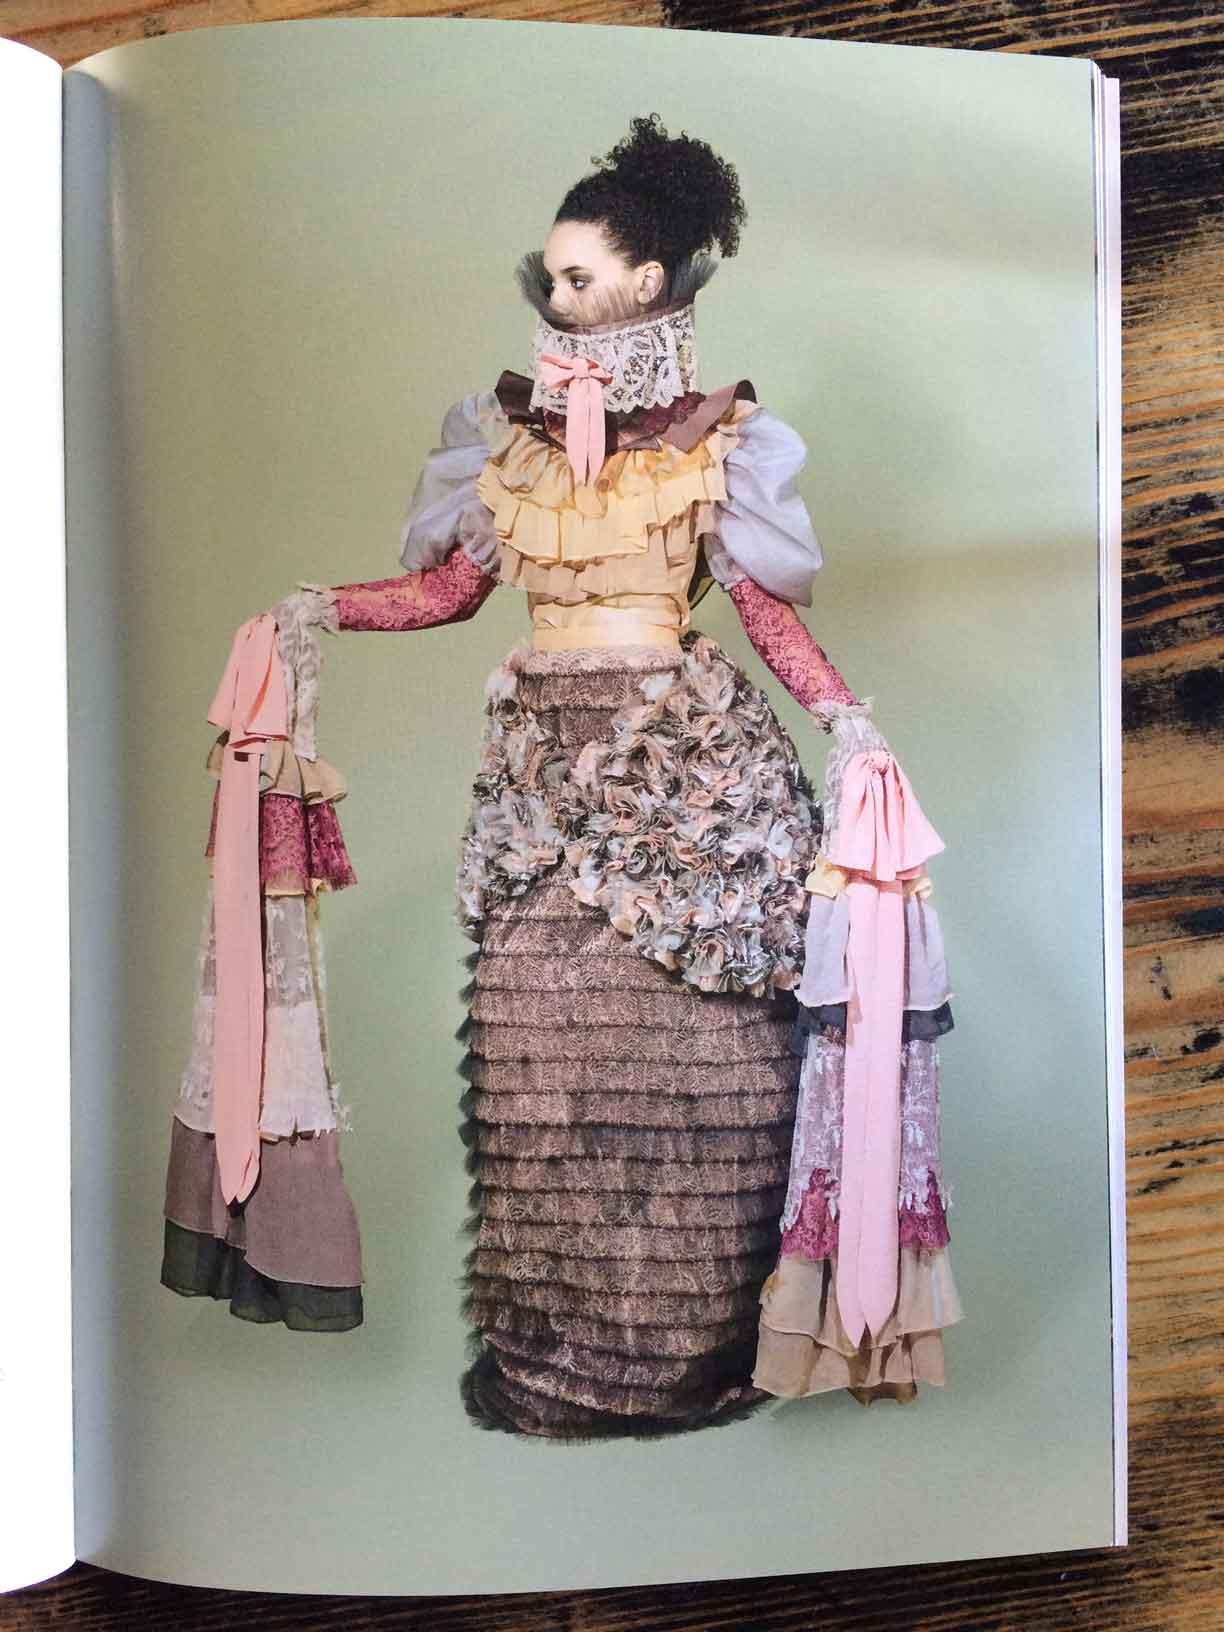 """An Excellent Ornament of Man,"" 2016, by Elizabeth Thomas, BA Hons Fashion Design, Manchester School of Art."